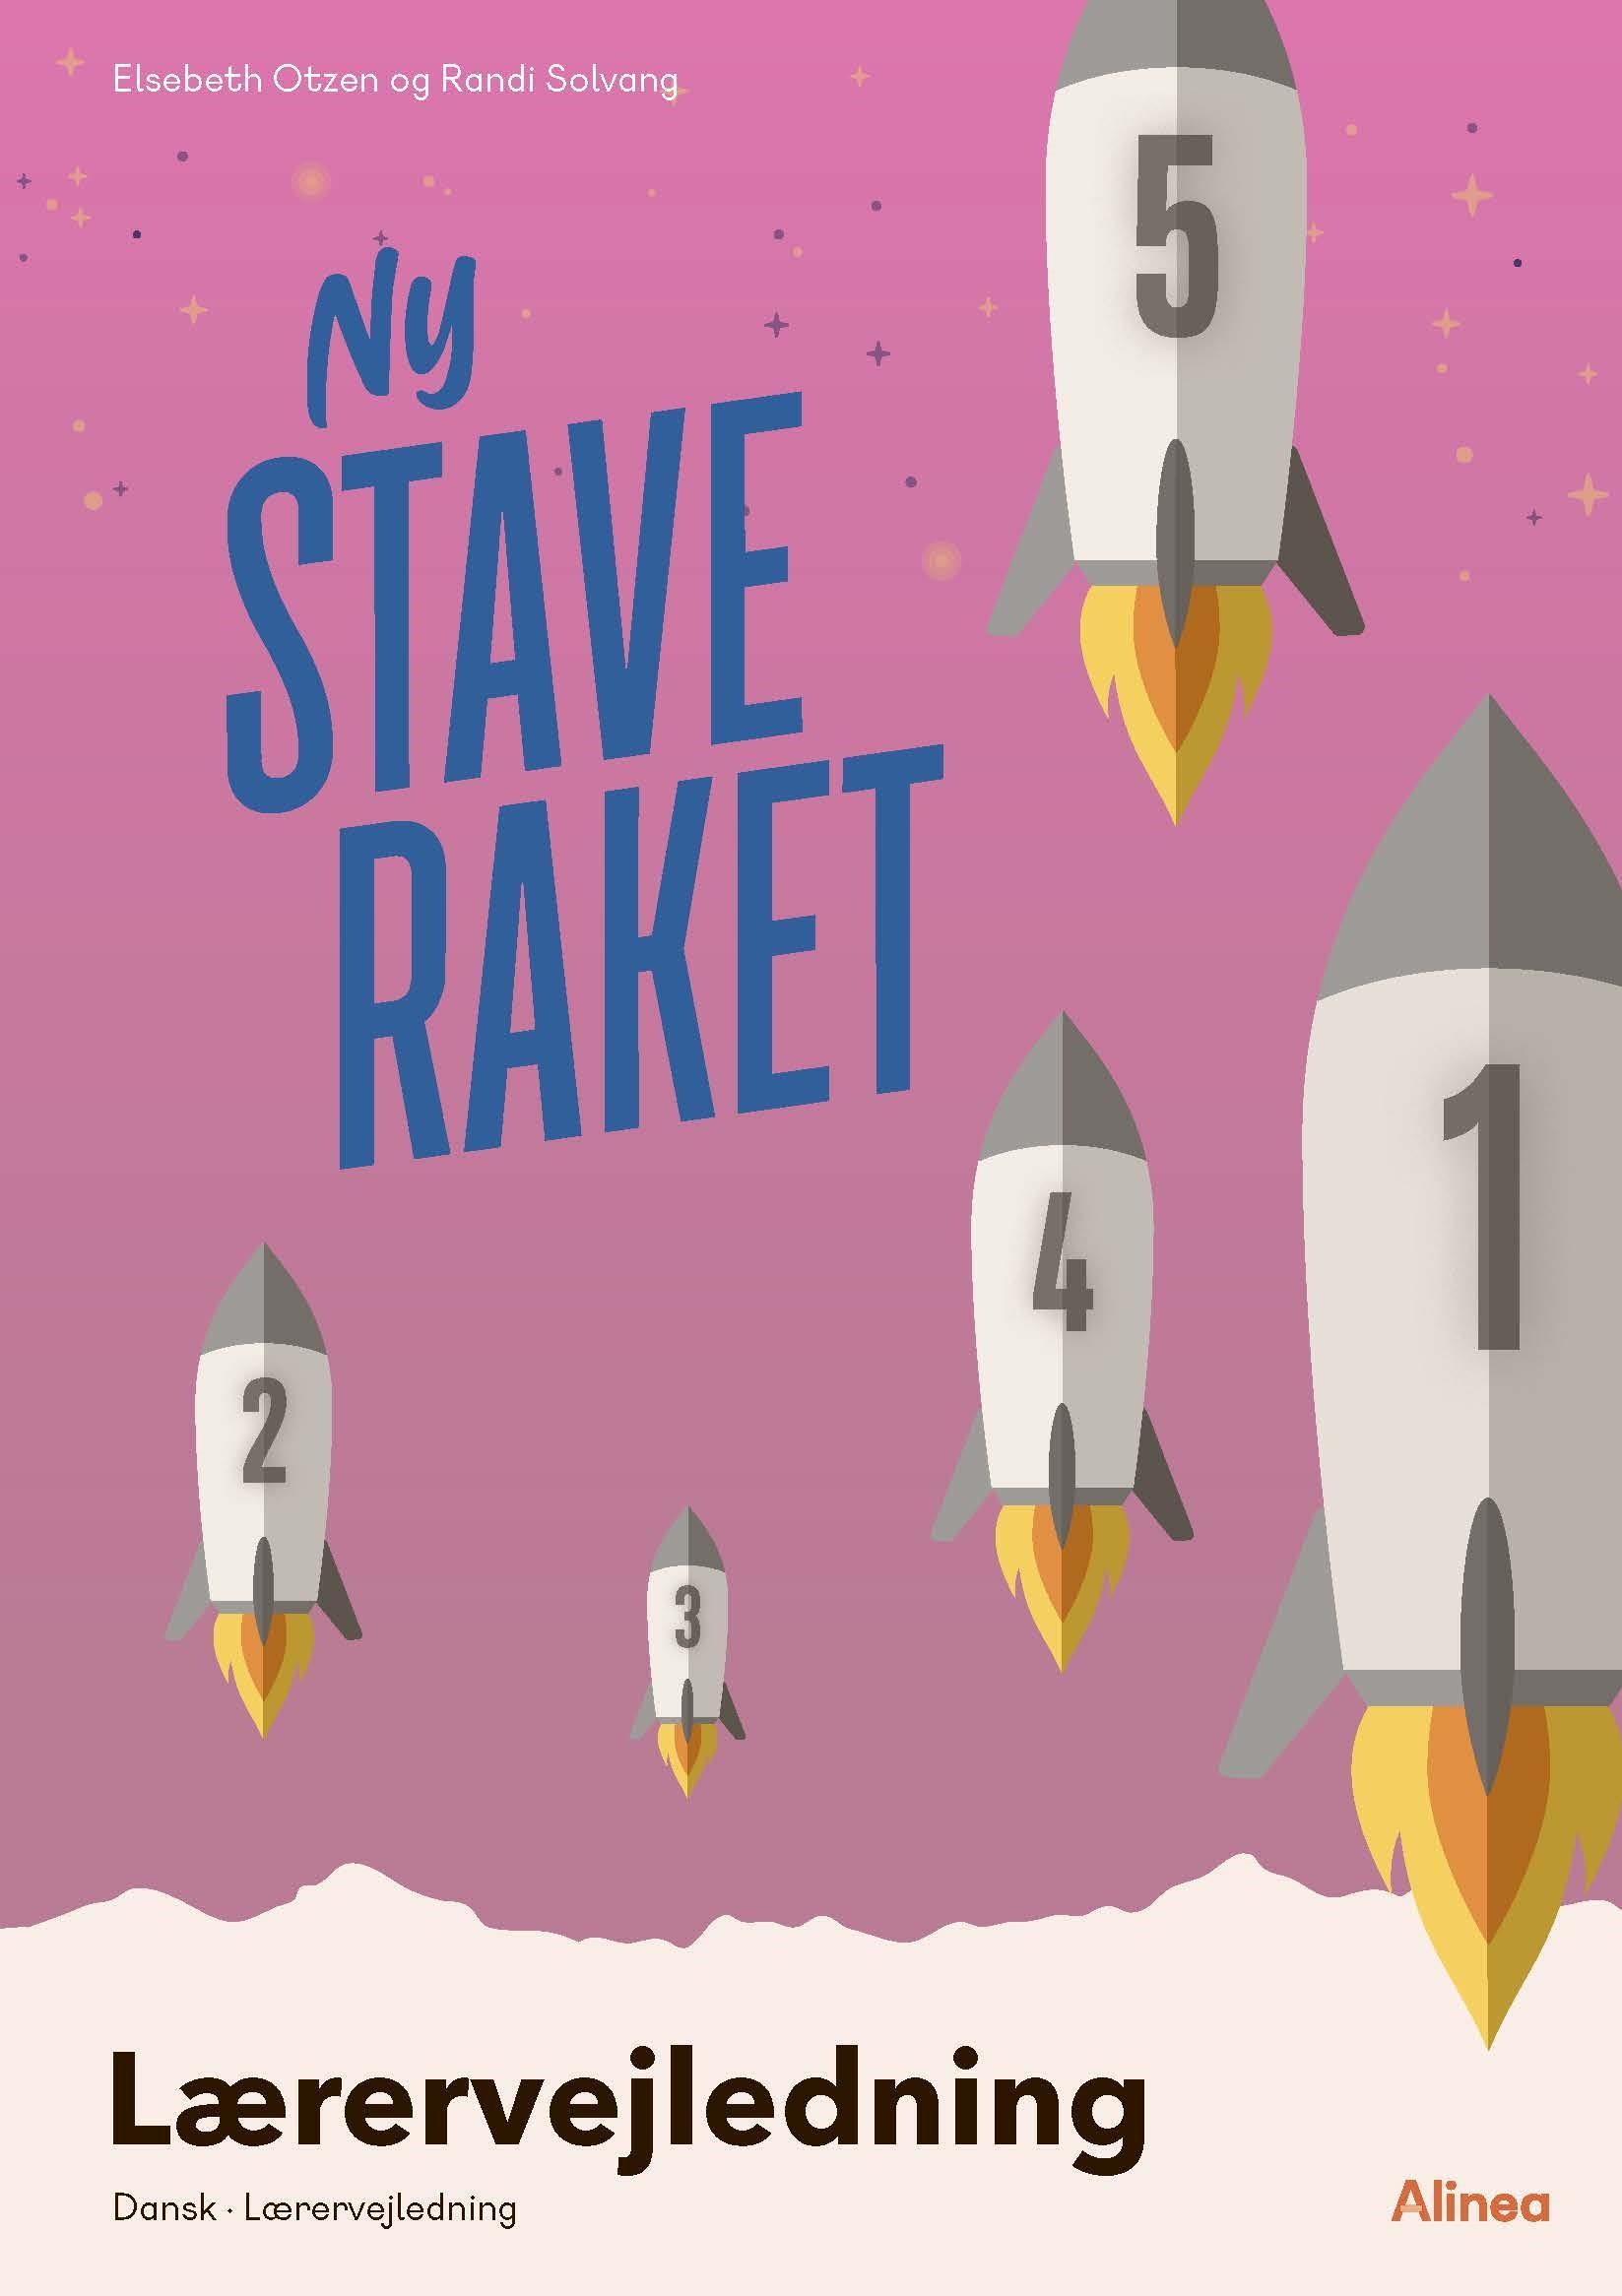 Ny Staveraket: Ny Staveraket, lærervejledning - Elsebeth Otzen; Randi Solvang - Bøger - Alinea - 9788723540560 - August 6, 2021